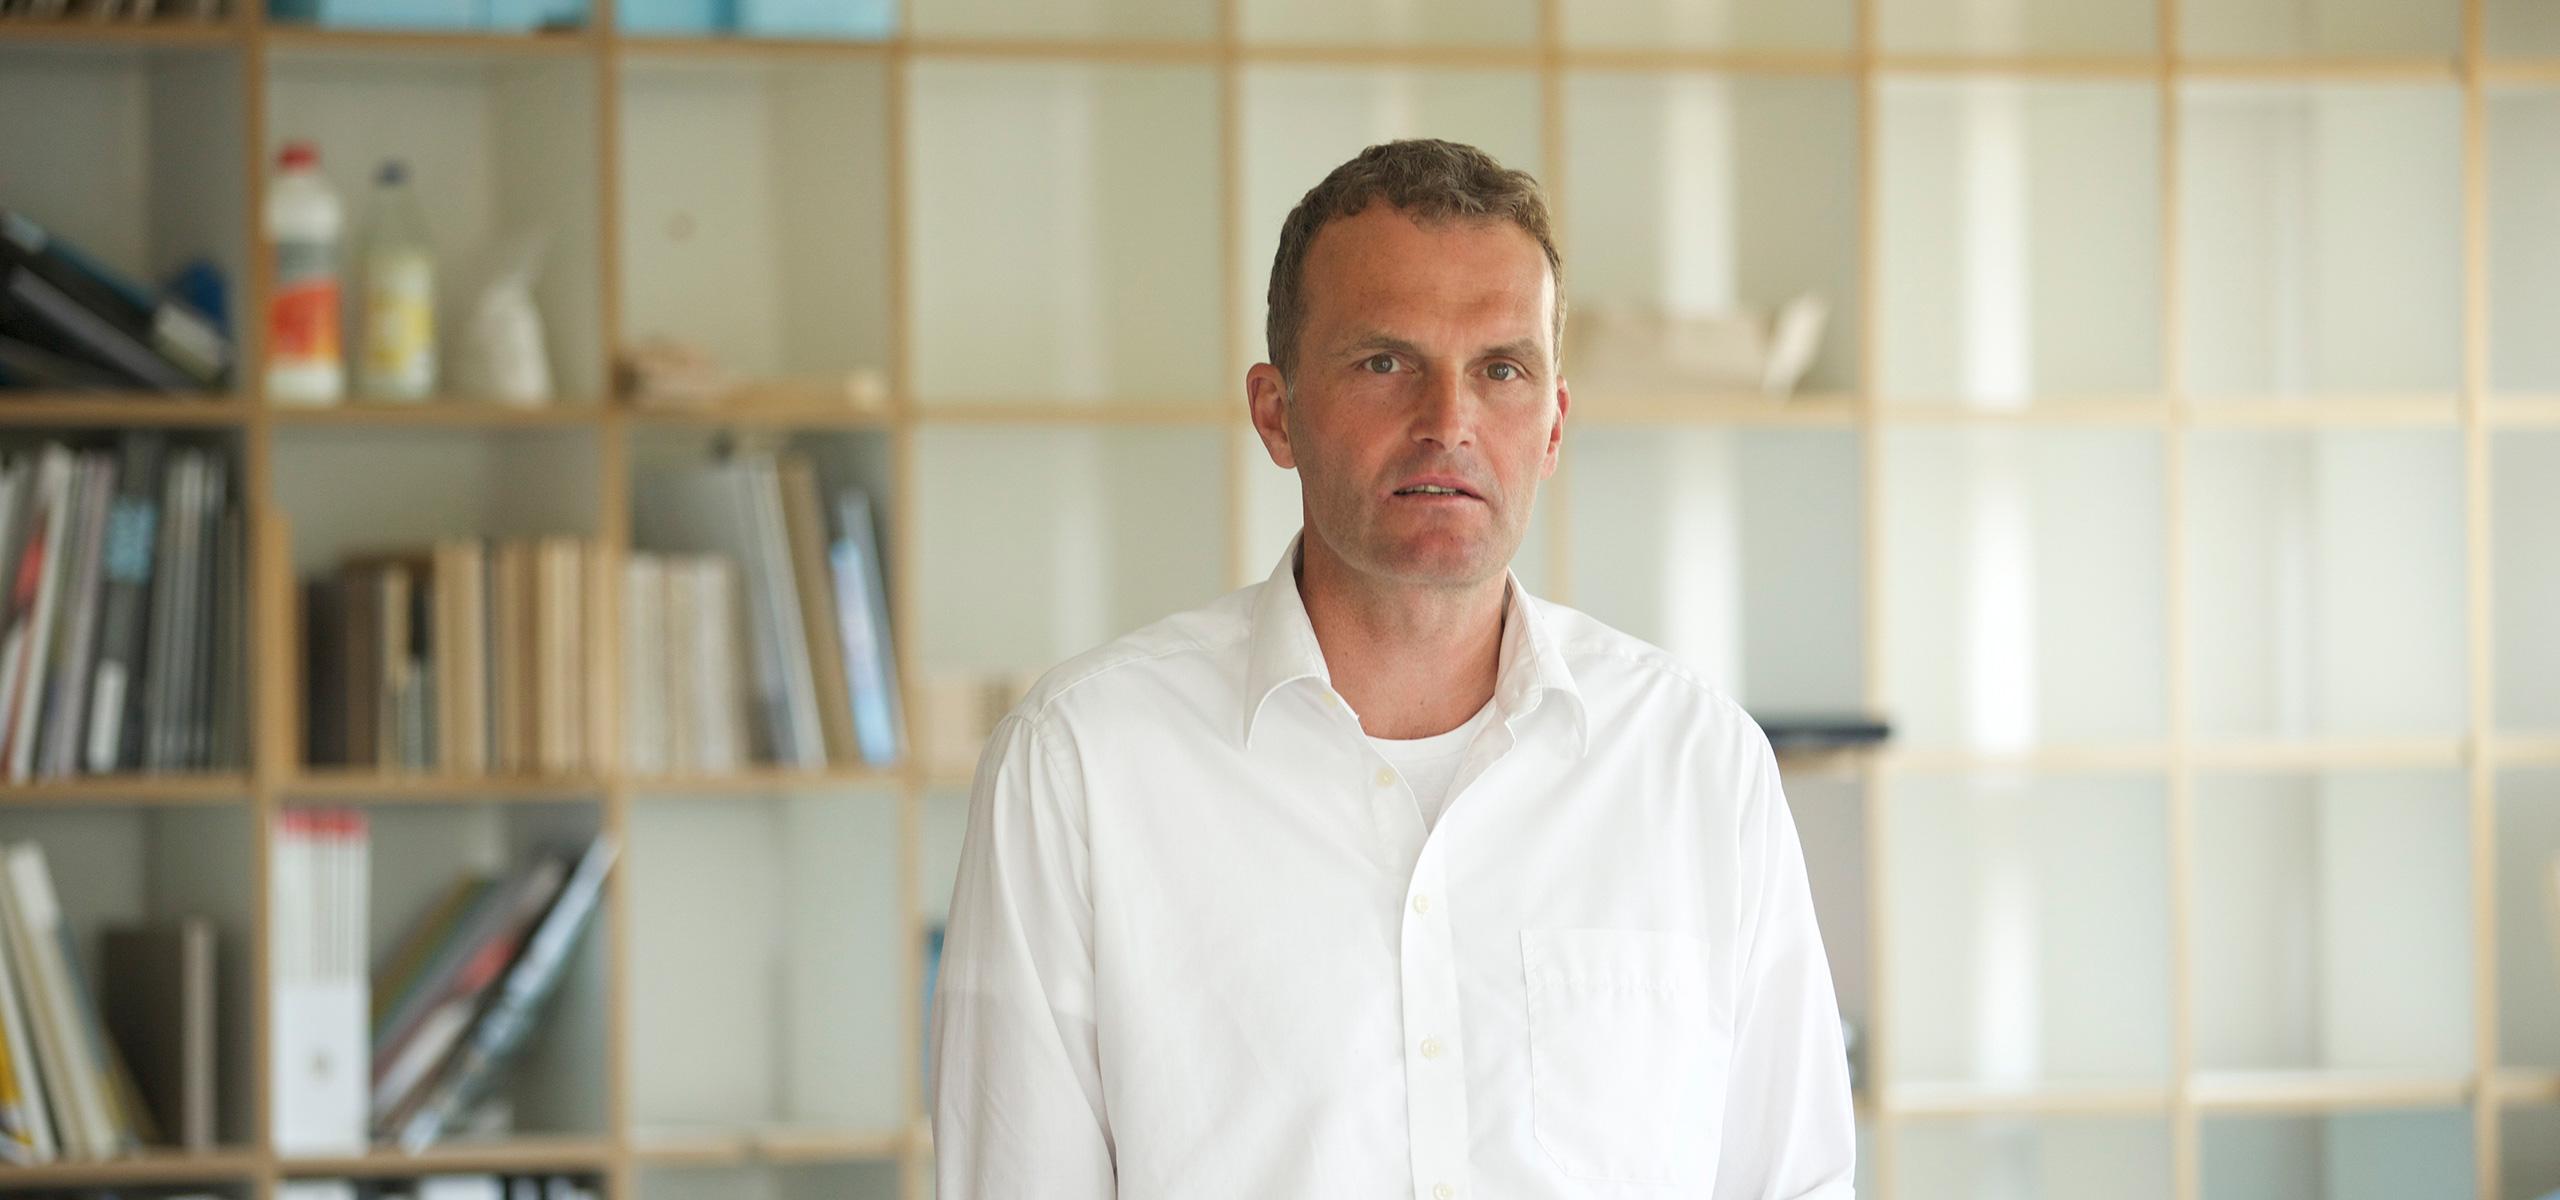 c6bd0548d9 VARIO BüroEinrichtungen: Prof. Klaus Michel über PET PORT - Prof ...